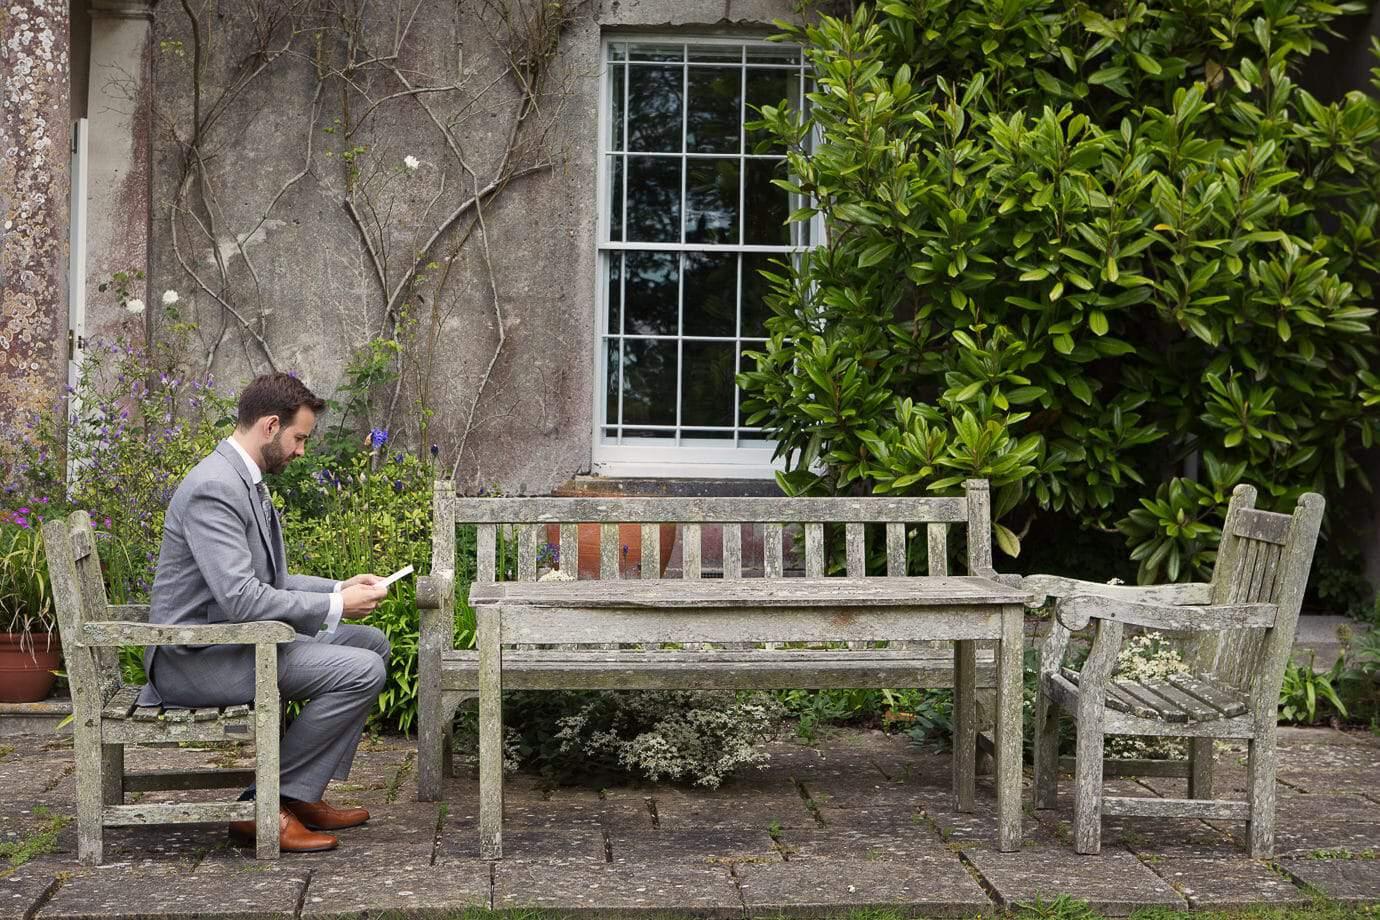 Groom practices wedding speech on at Plush Manor wedding venue in Dorset